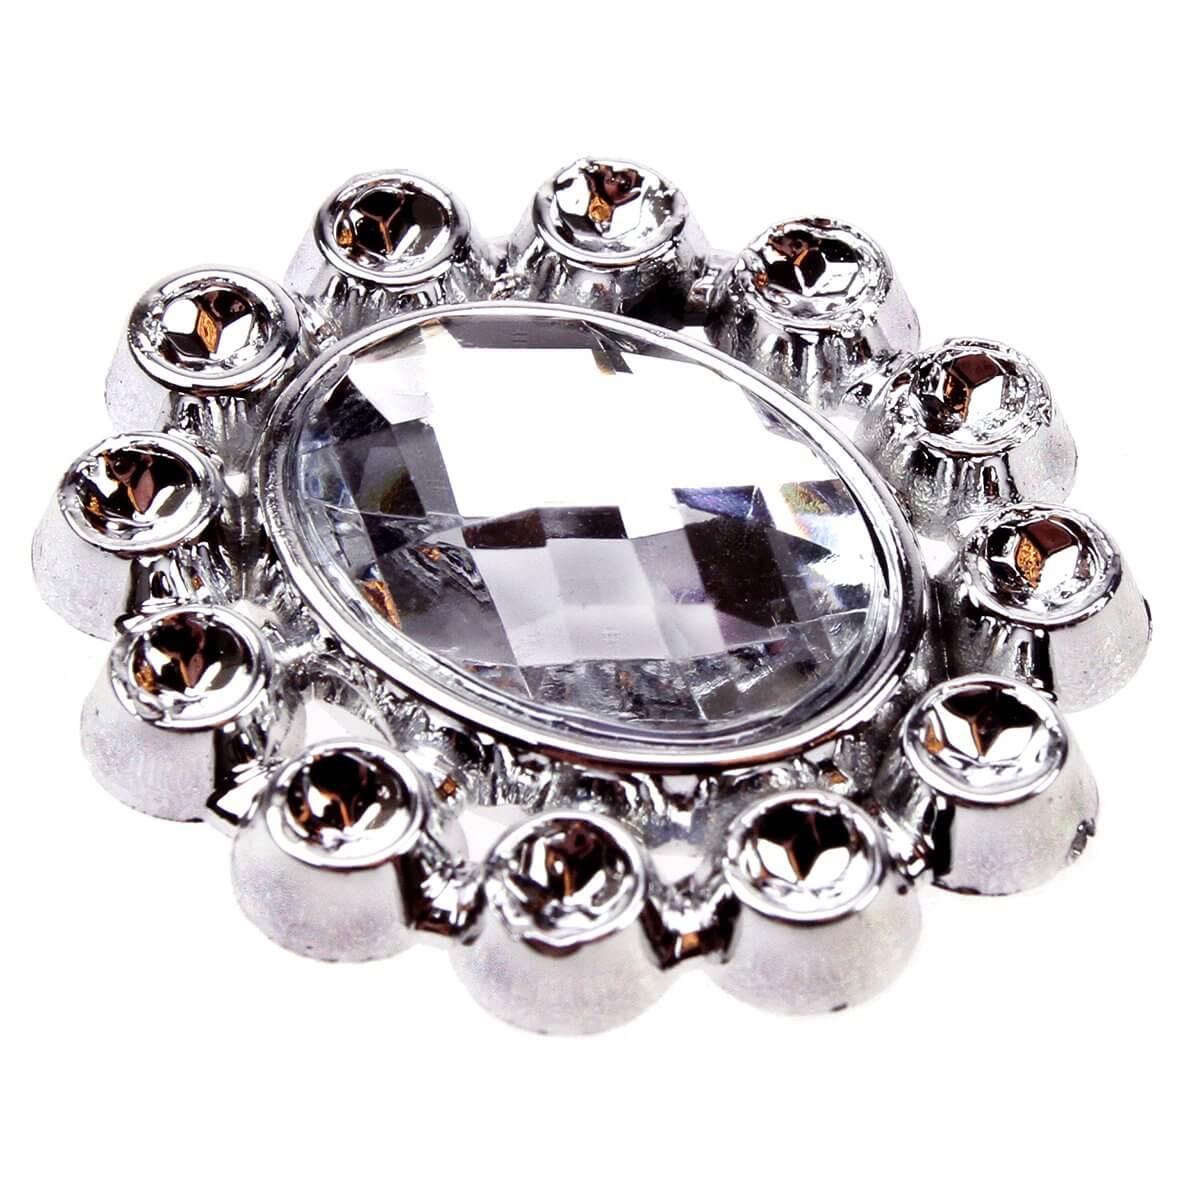 Diamante Faux Gem Oval Embellishment